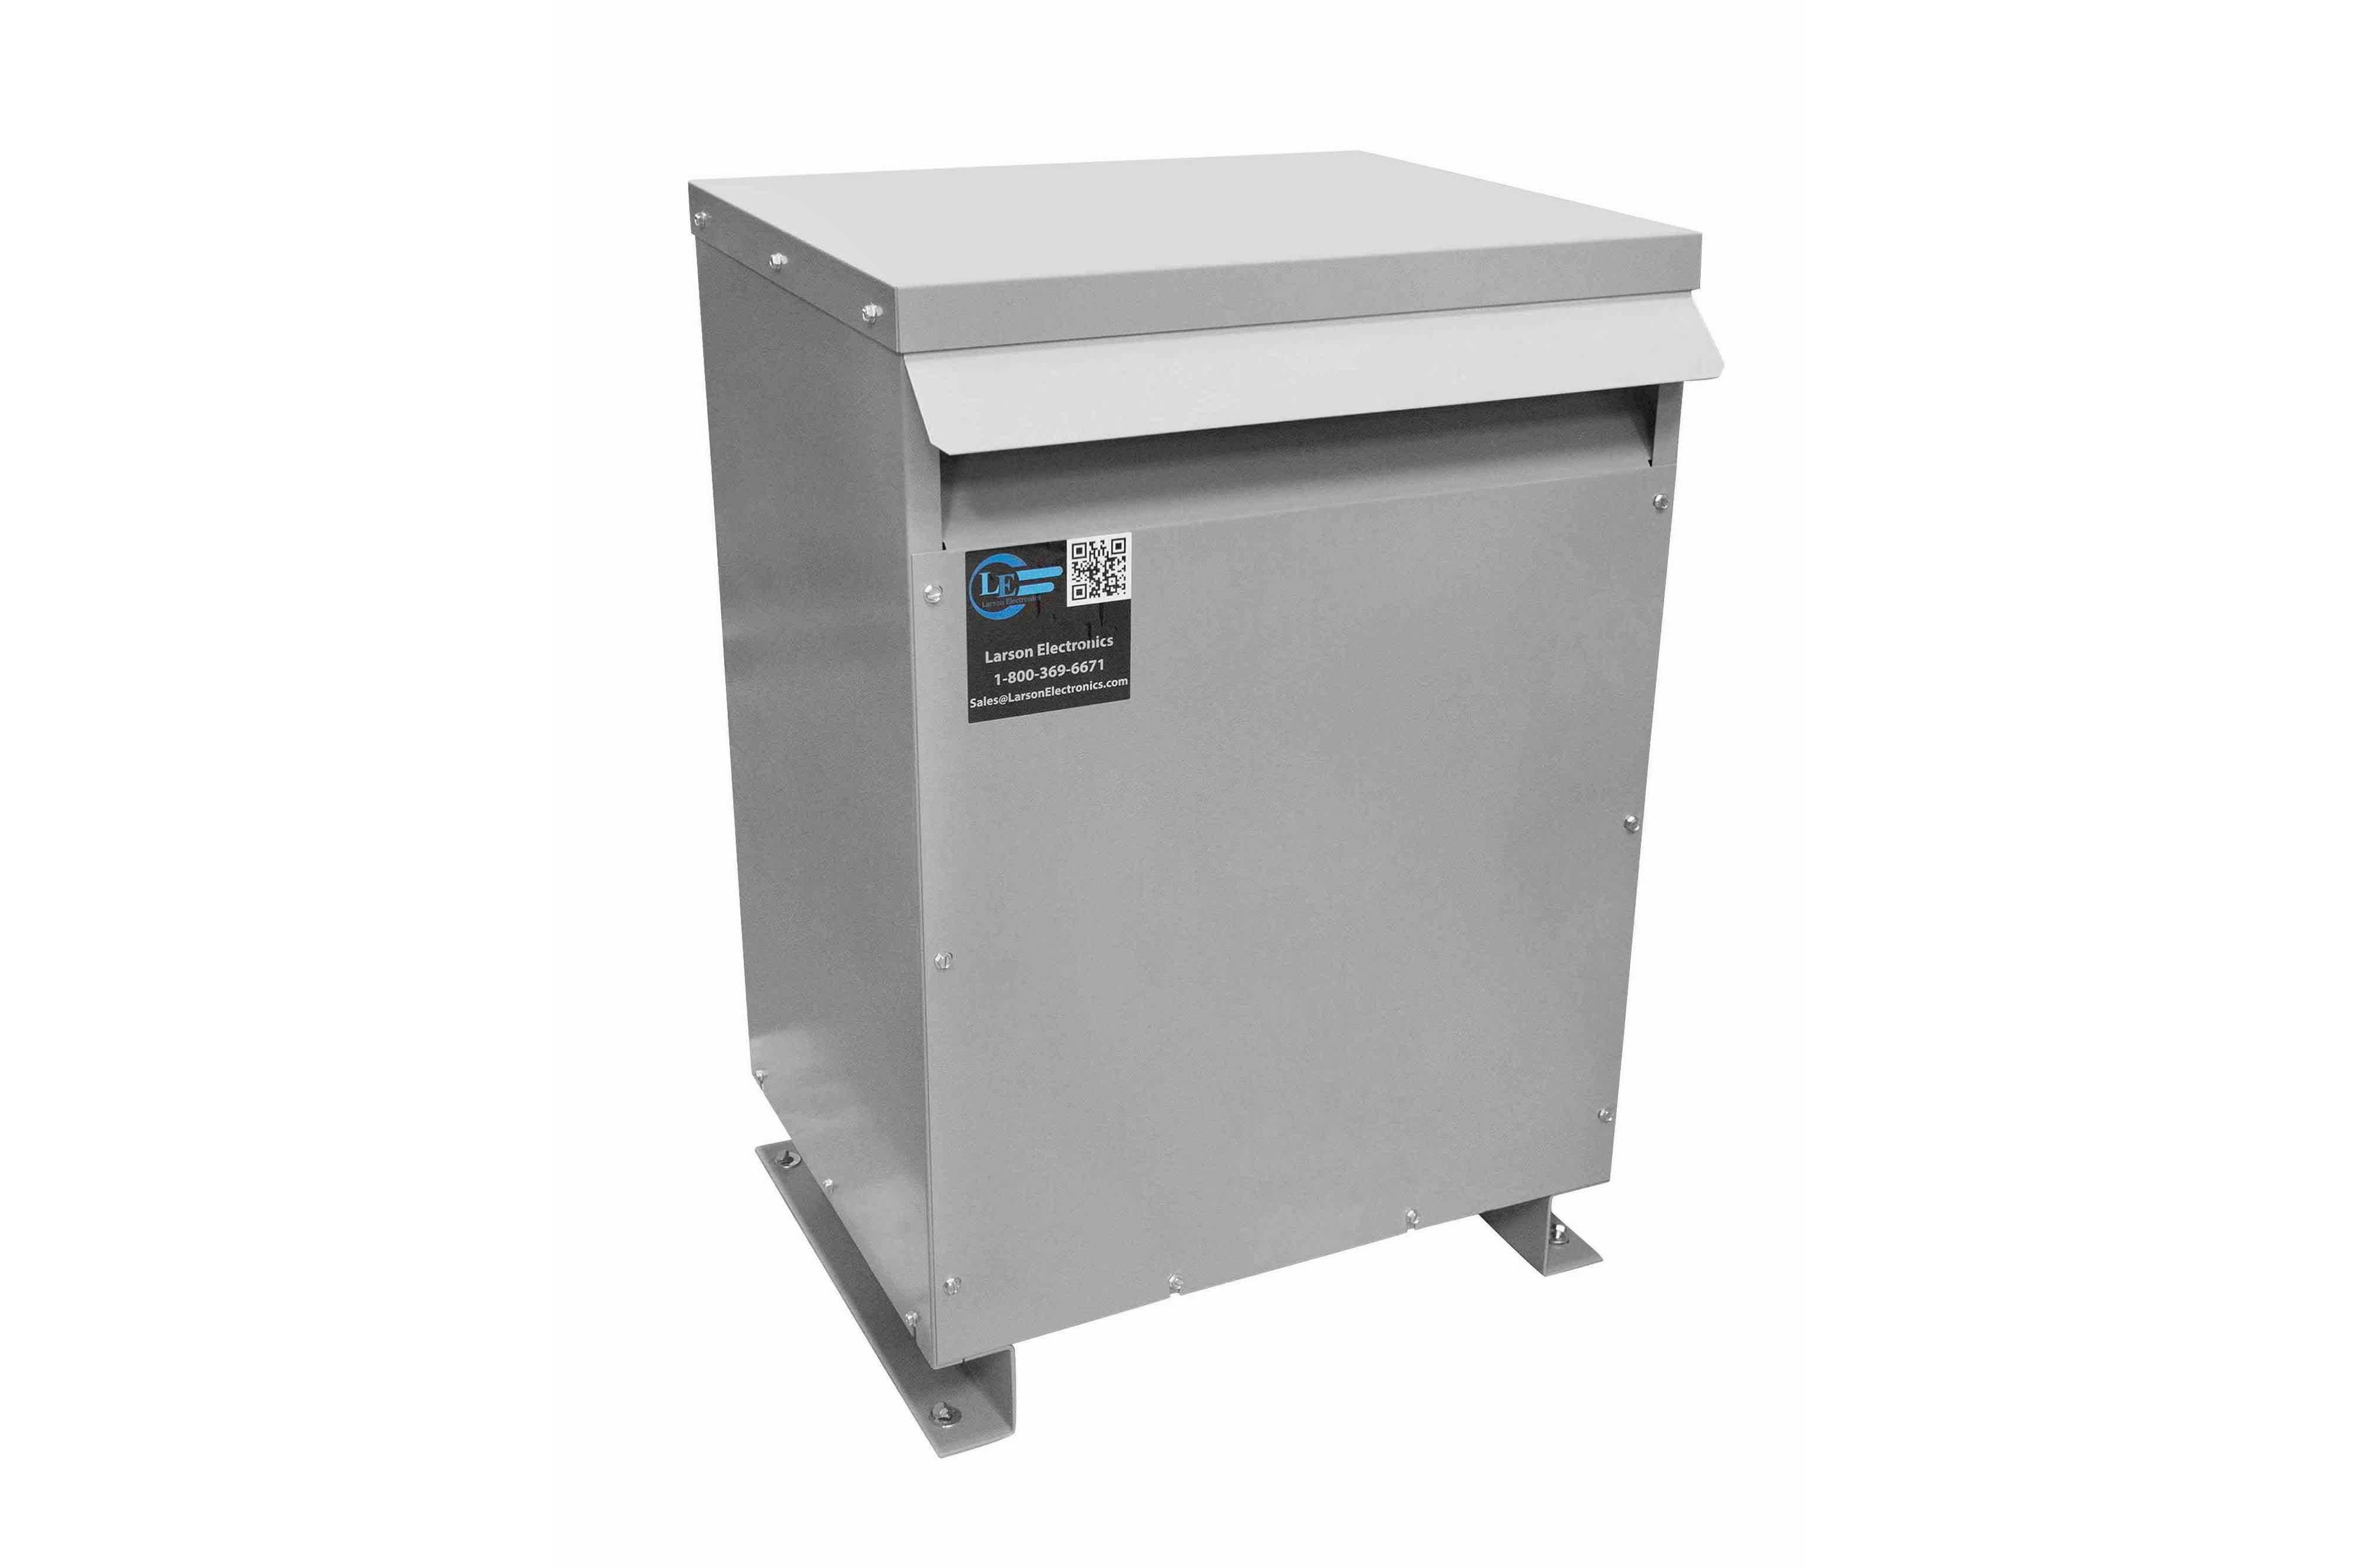 36 kVA 3PH Isolation Transformer, 208V Wye Primary, 400Y/231 Wye-N Secondary, N3R, Ventilated, 60 Hz